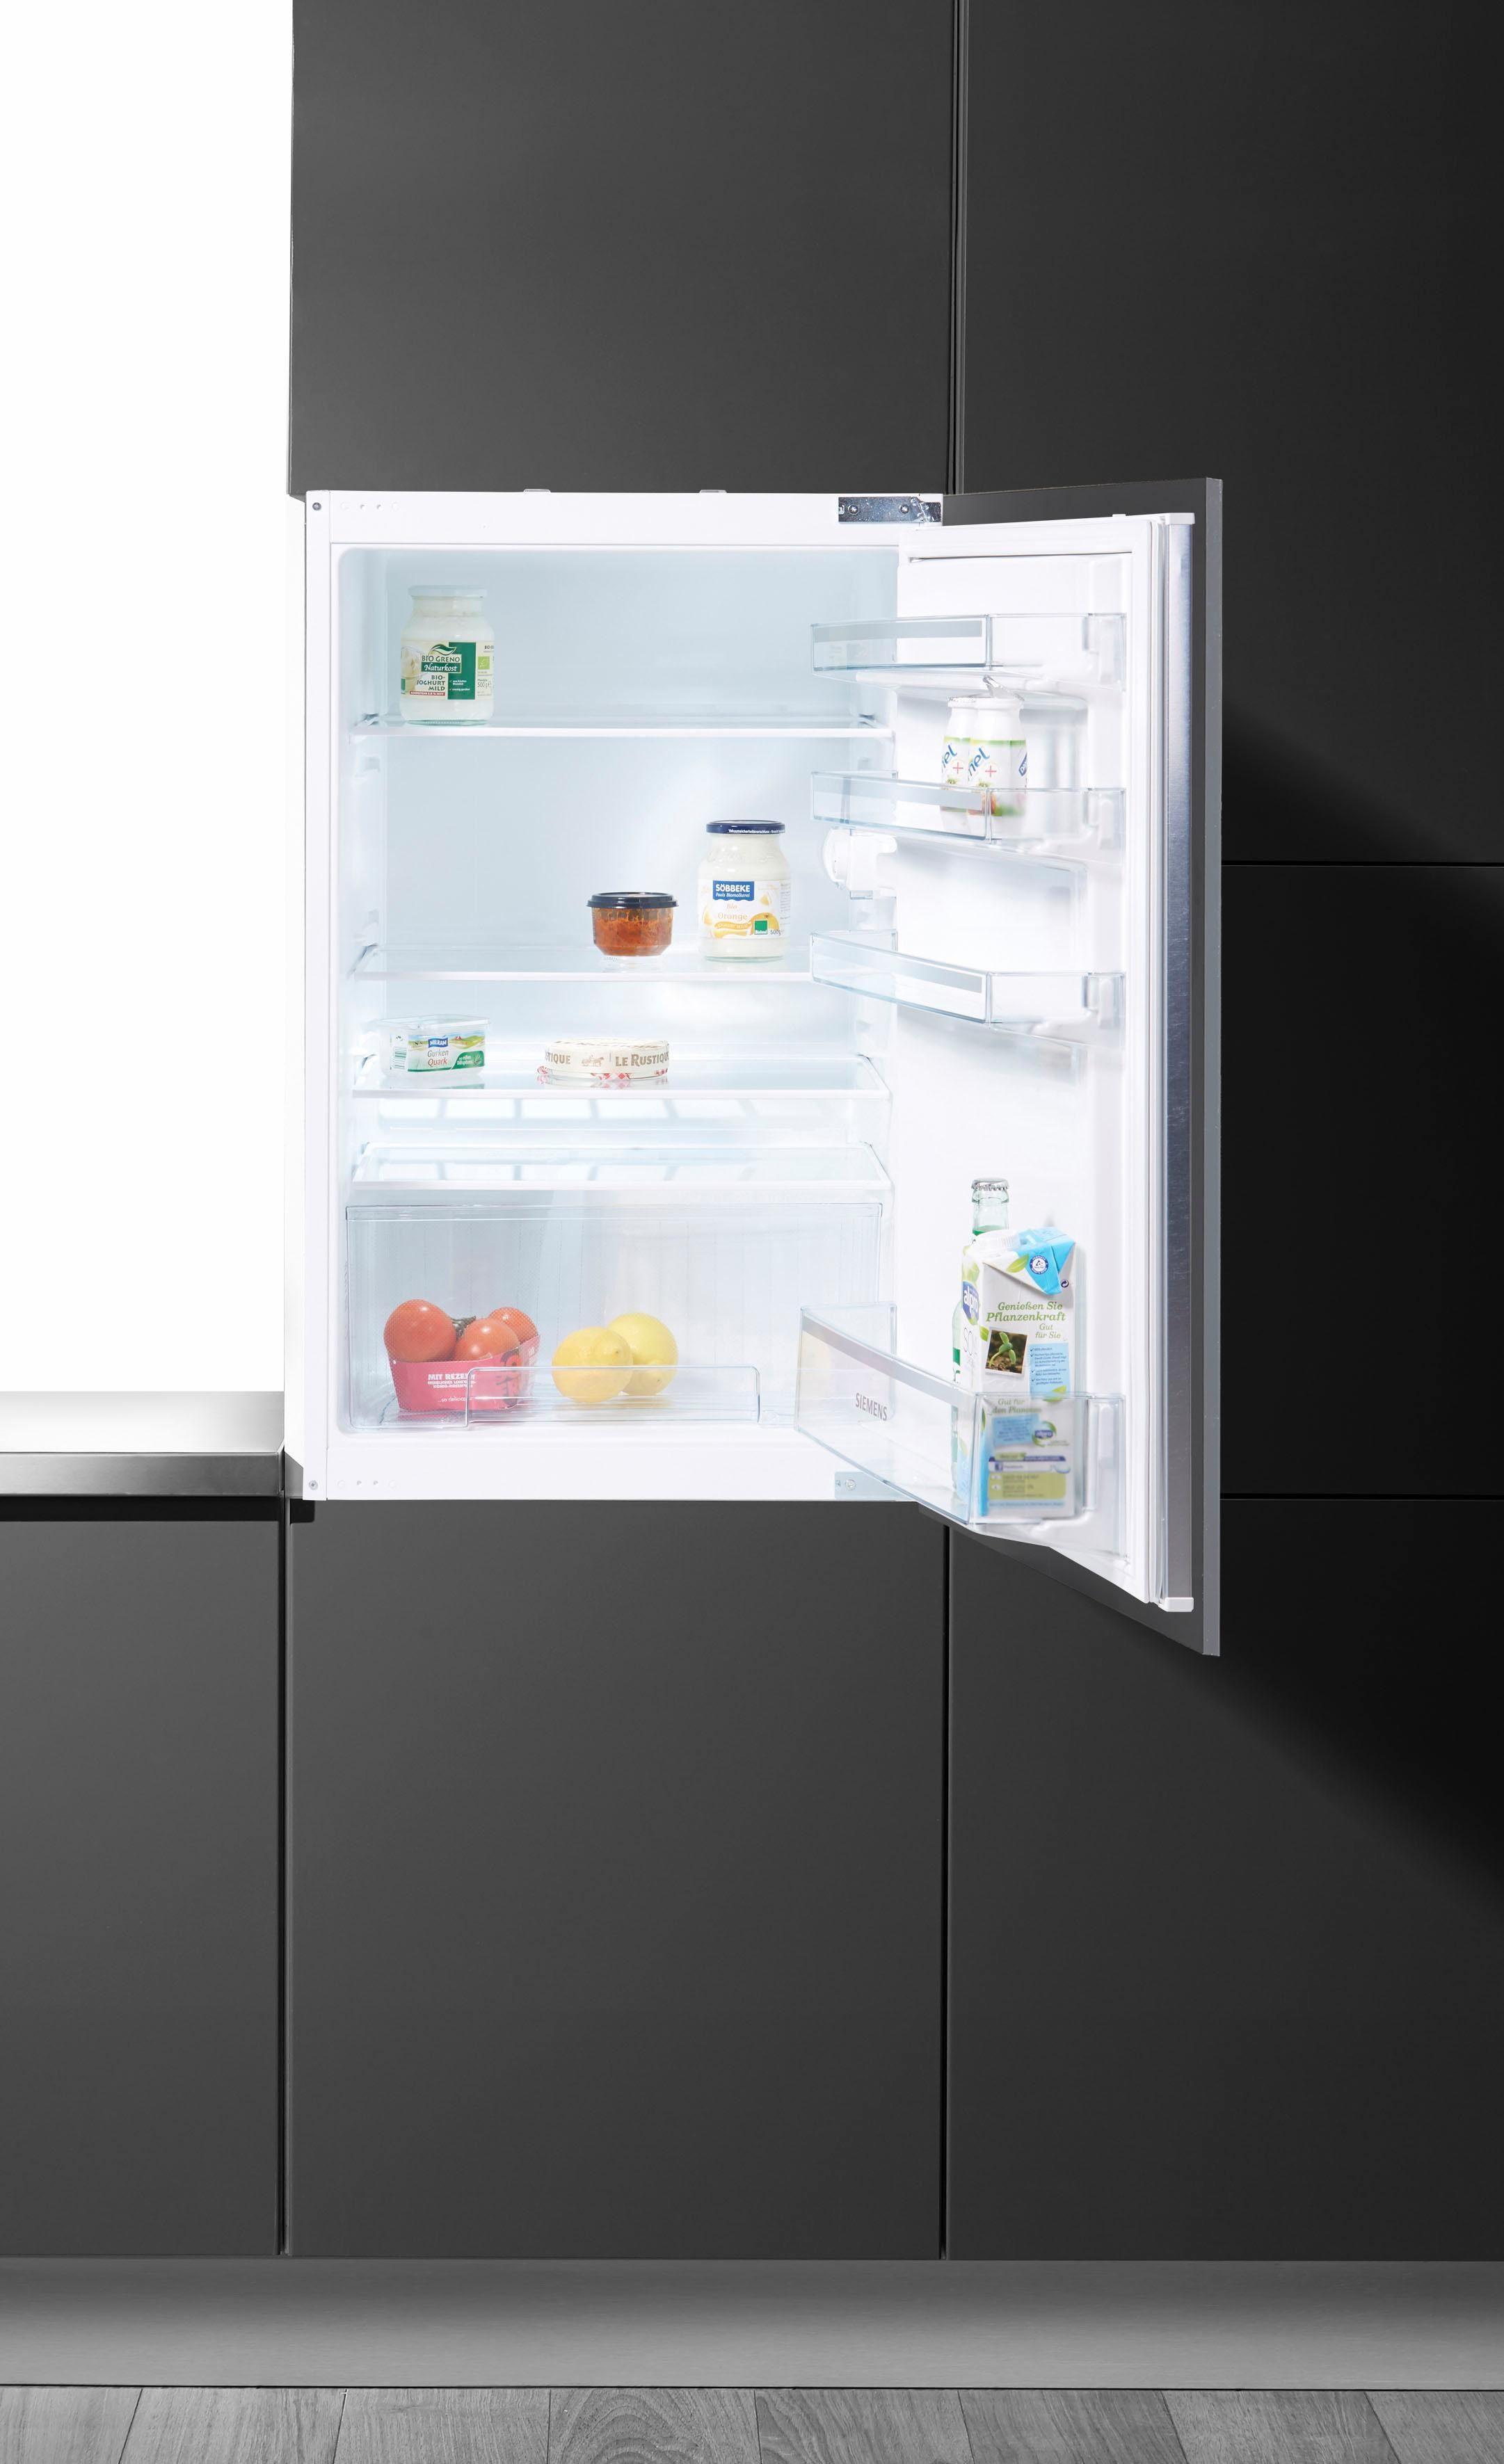 Siemens Einbau-Kühlschrank KI18RV20, Energieklasse A+, 87,4 cm hoch